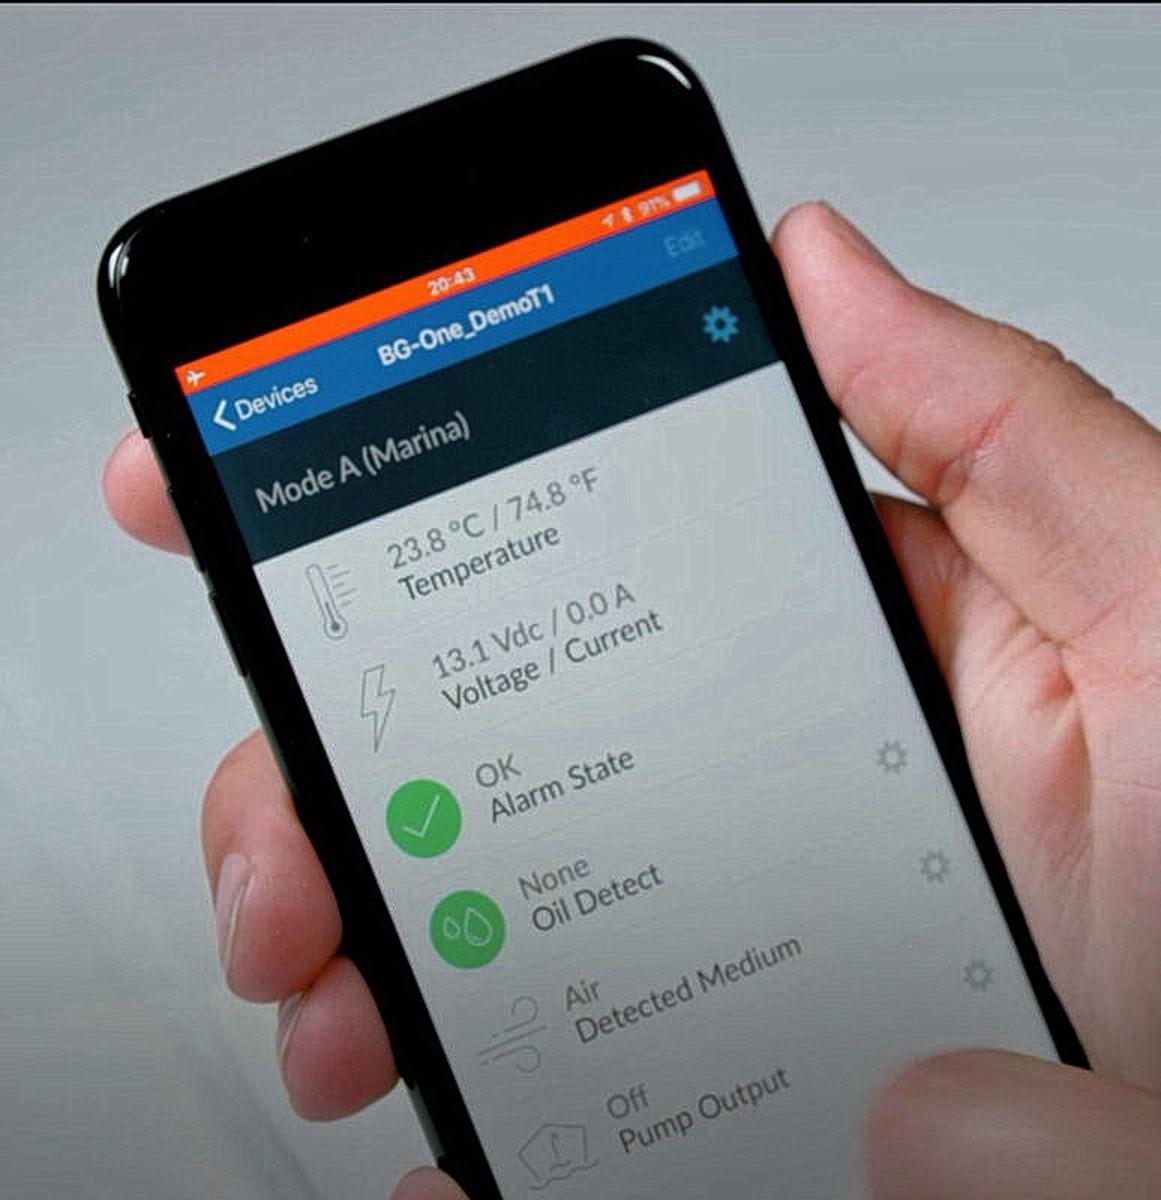 configuration via mobile app.